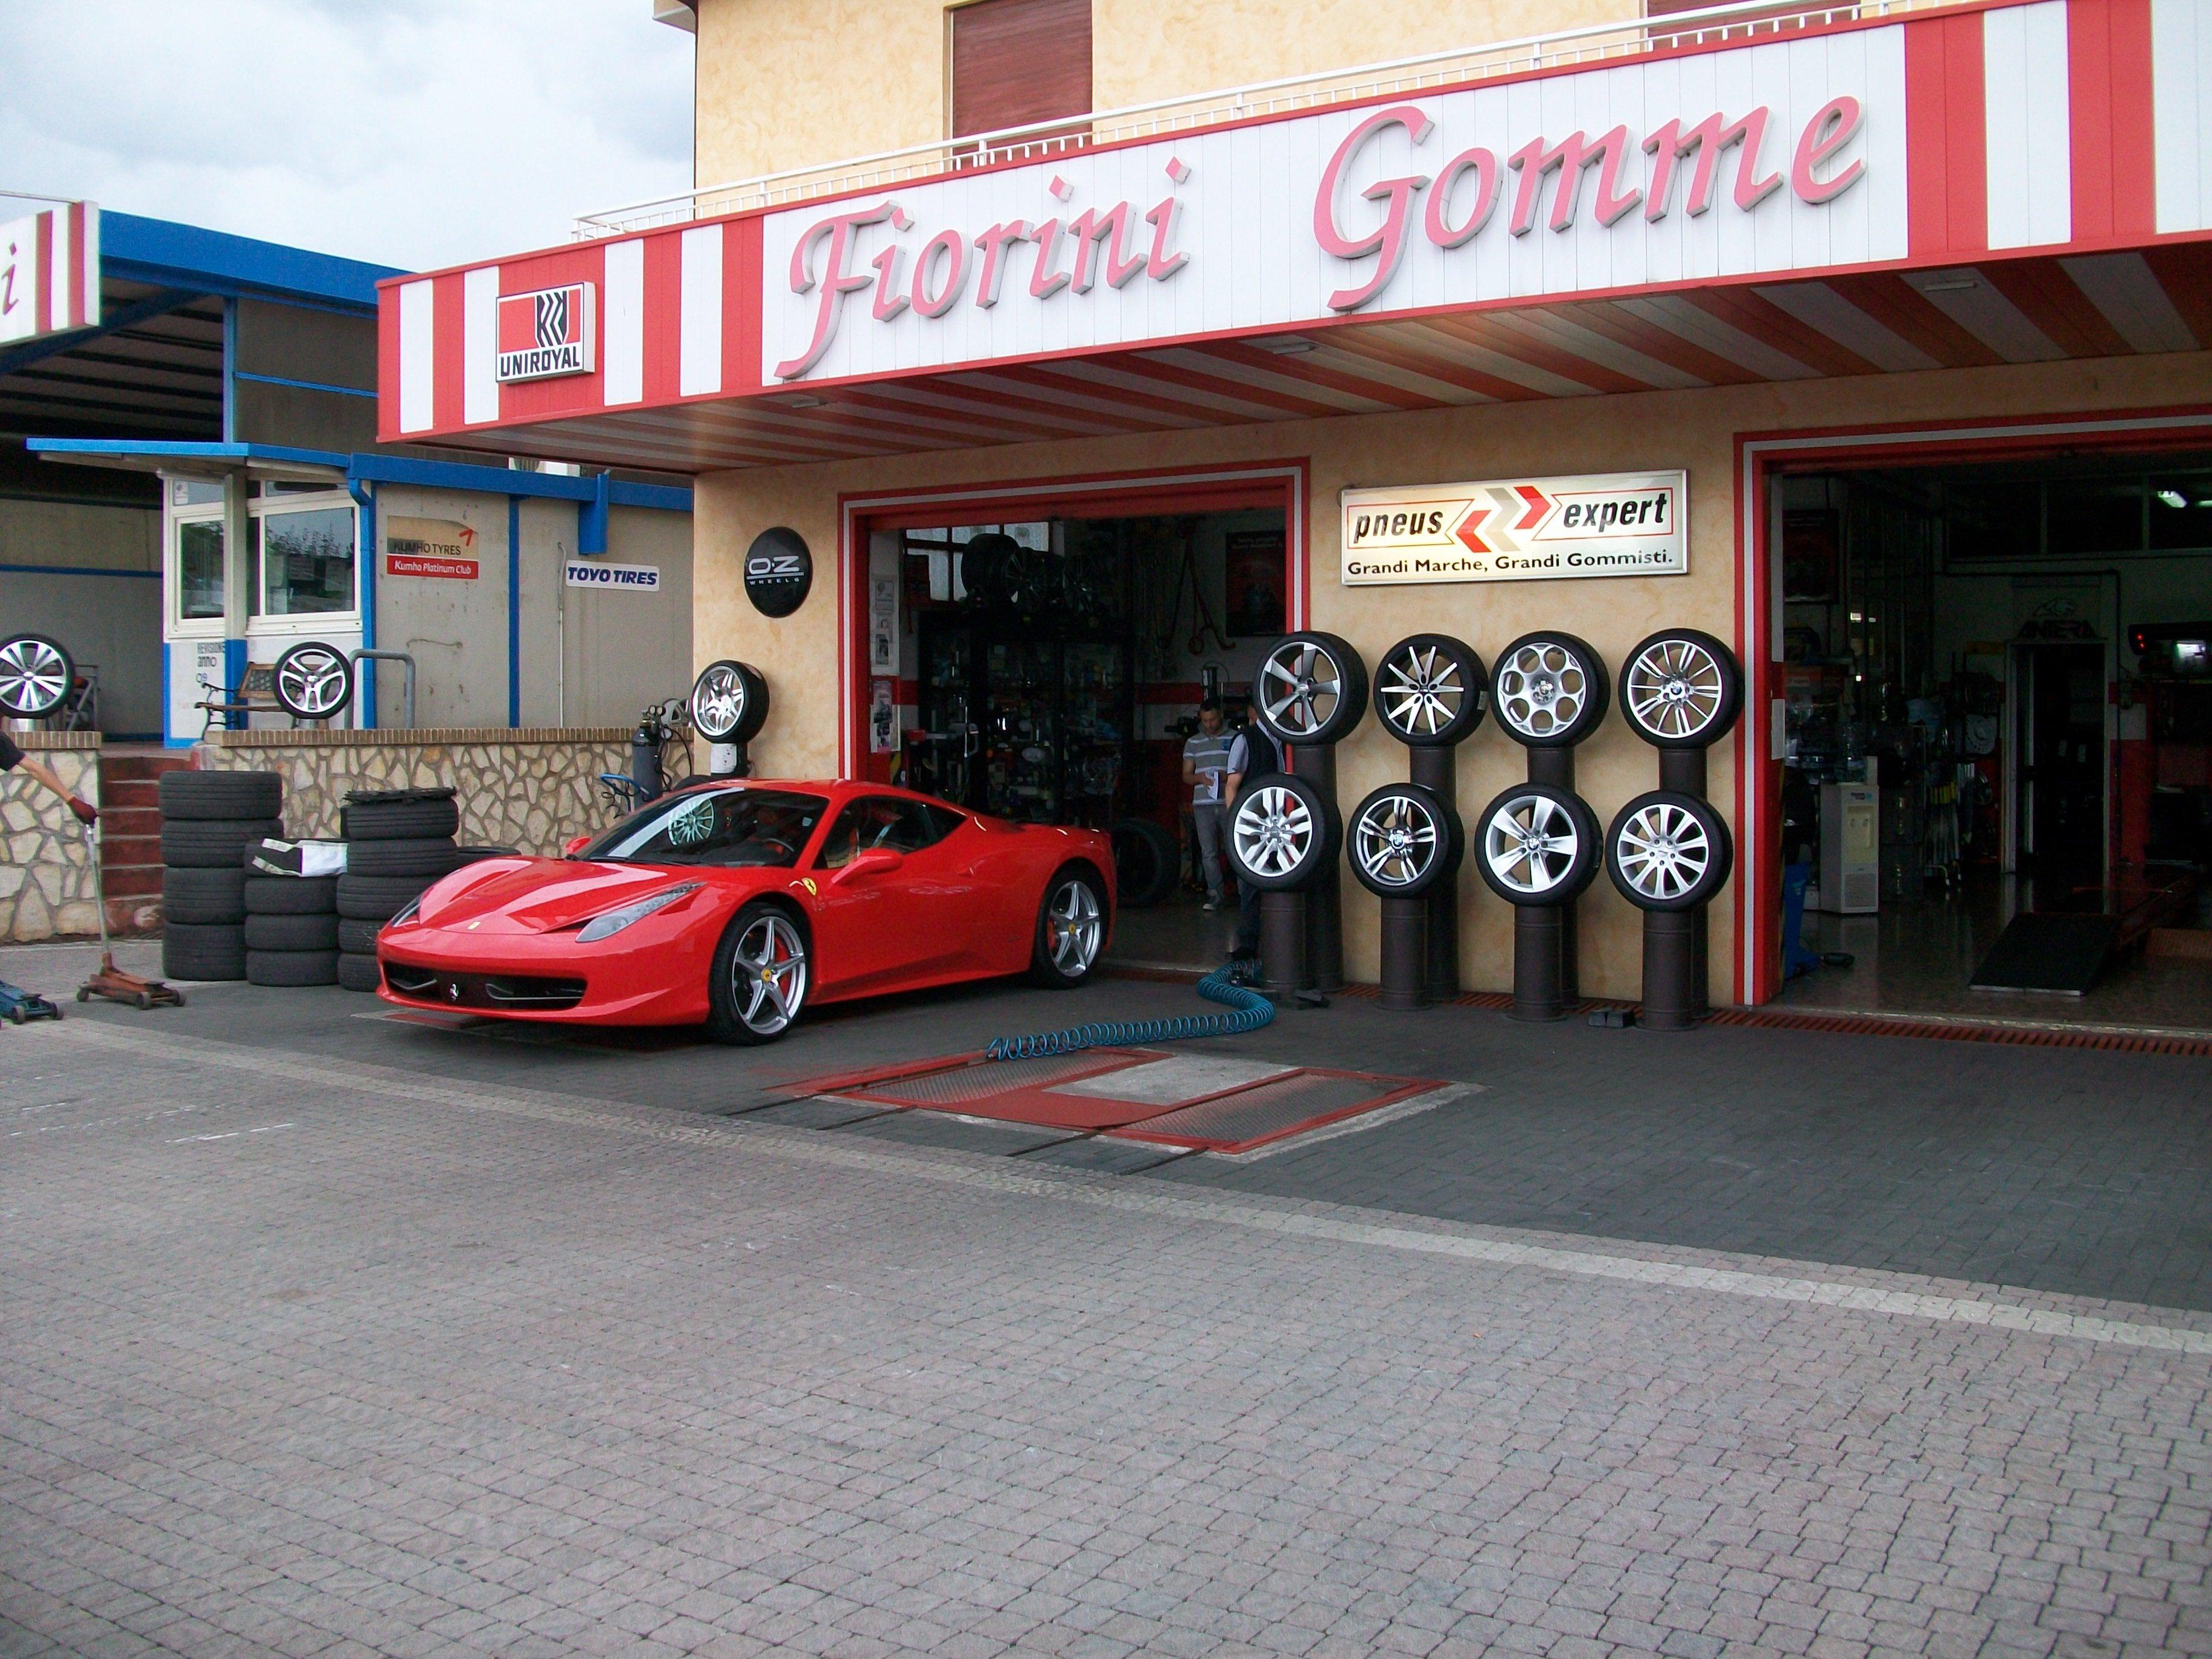 Esterno officina con Ferrari